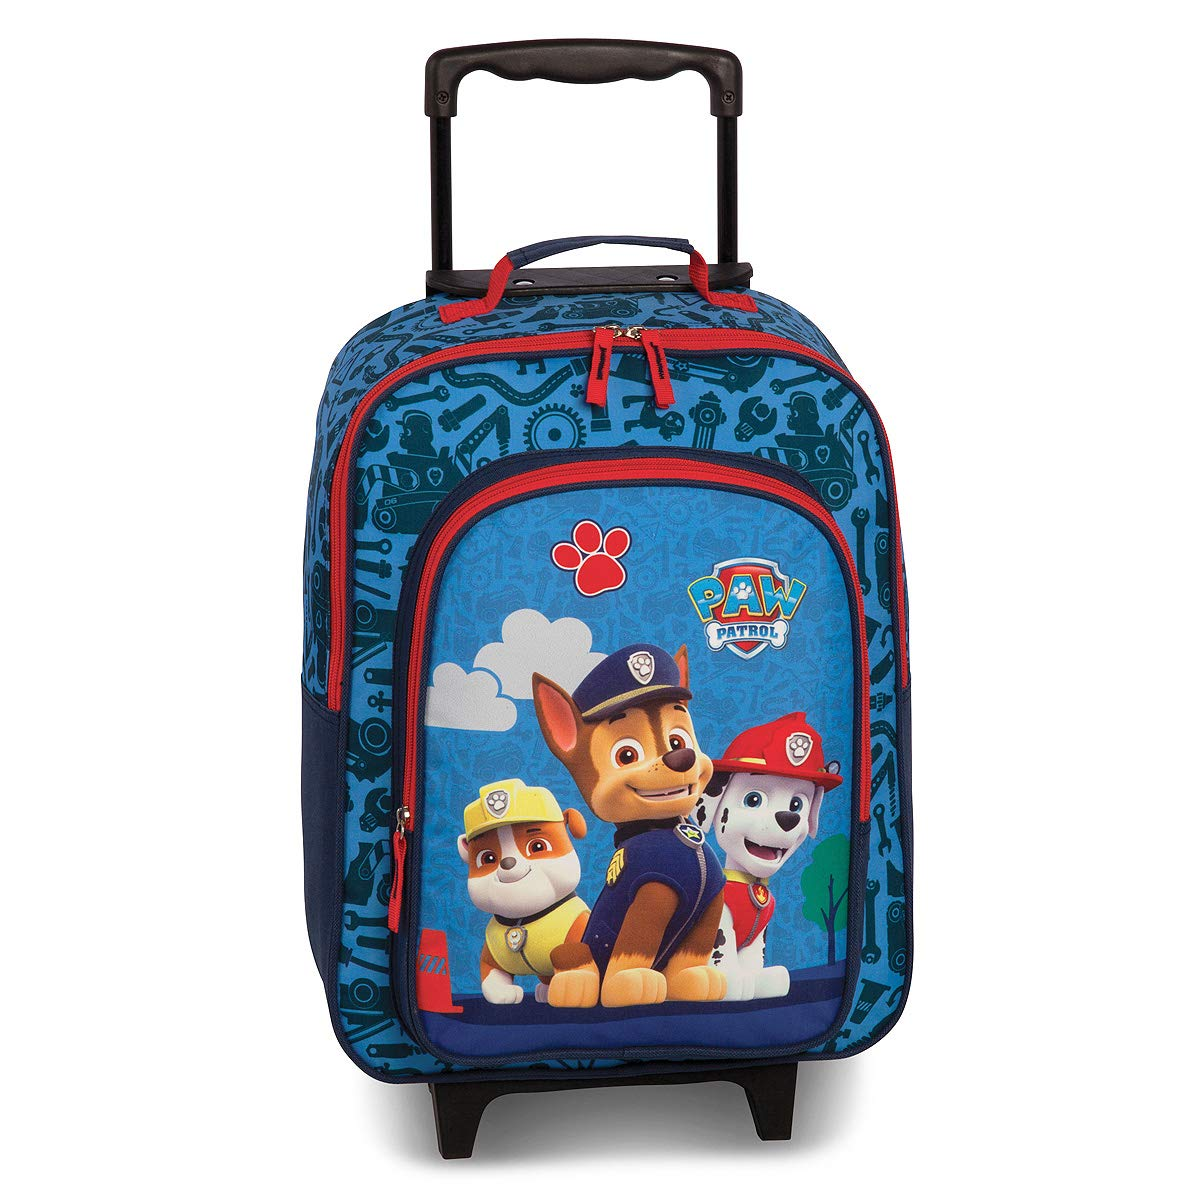 Fabrizio Viacom PAW Patrol Kindertrolley Kabinen Kinderkoffer Kindergep/äck 20579-0600